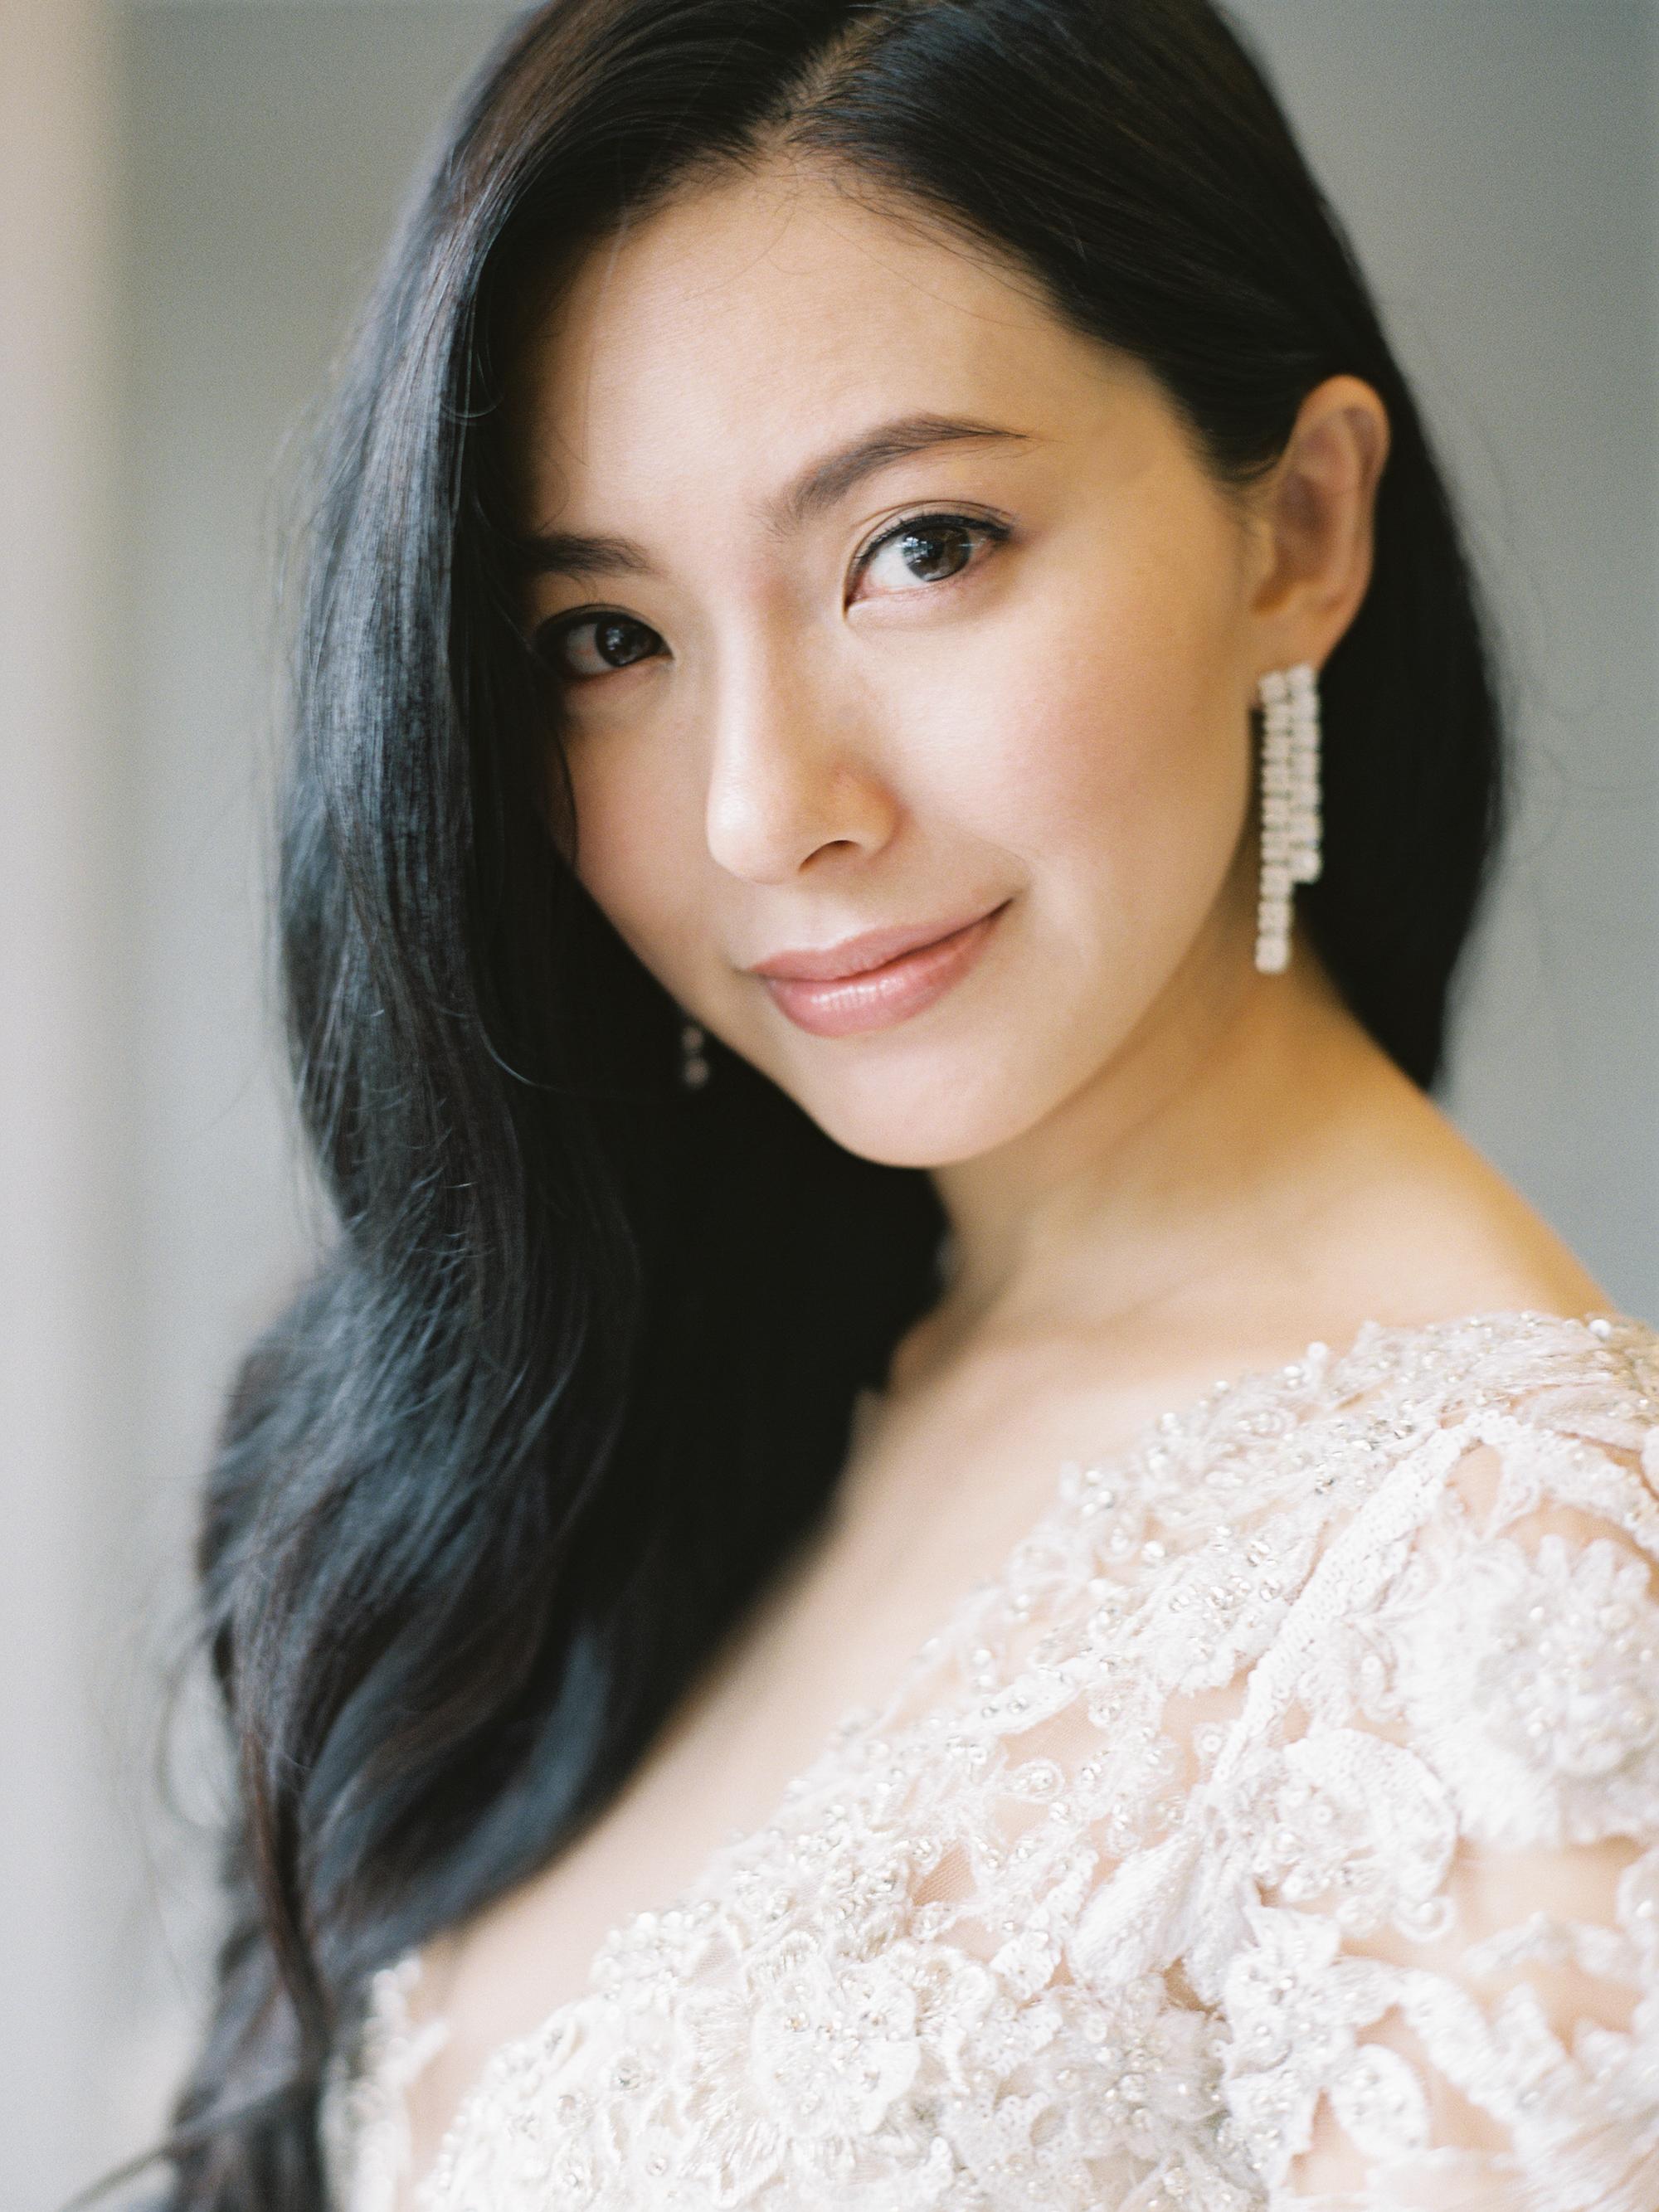 pre-wedding-shoot-singapore-1-Jen_Huang-005579-R1-015.jpg